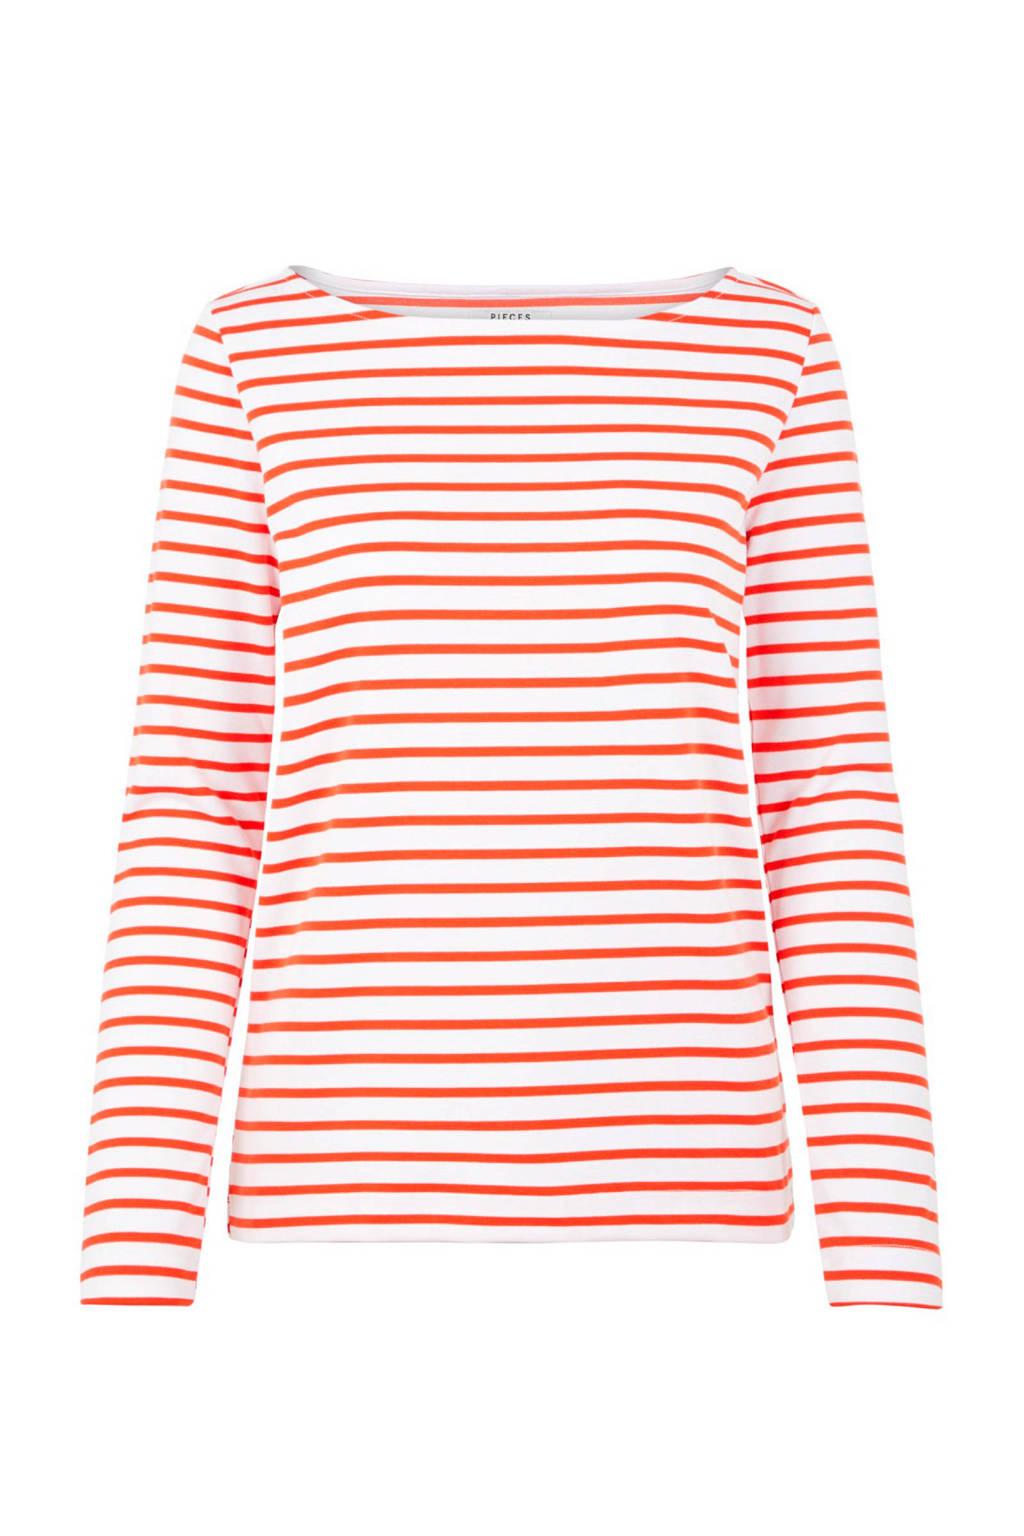 PIECES gestreepte longsleeve rood/wit, Rood/wit